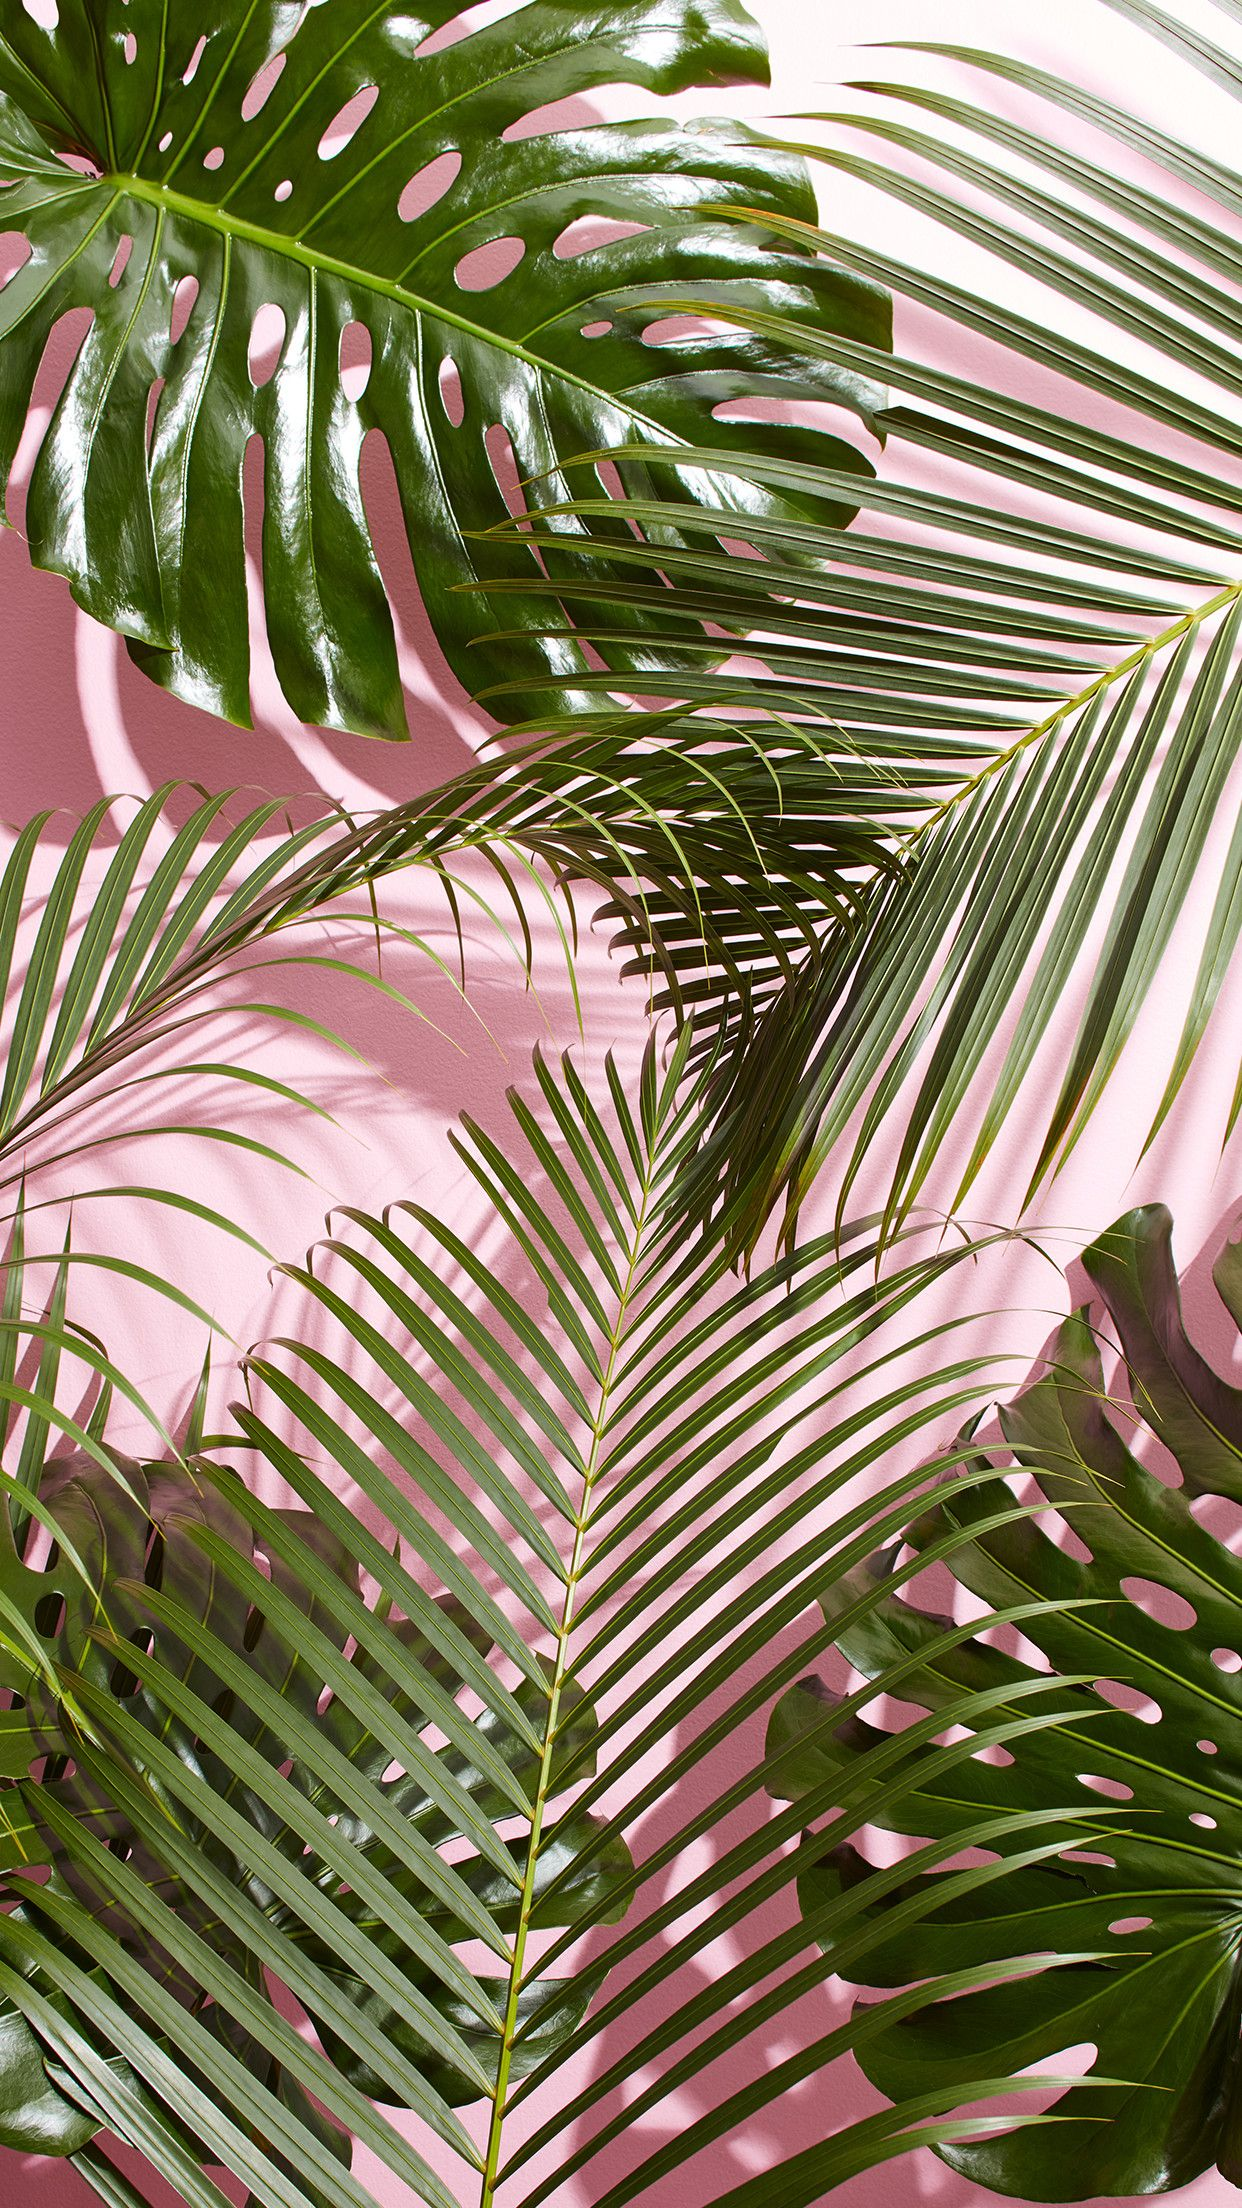 Tropical Palm Leaf Wallpaper   Data-src /img/194373 - Palm Leaves Wallpaper Iphone - HD Wallpaper